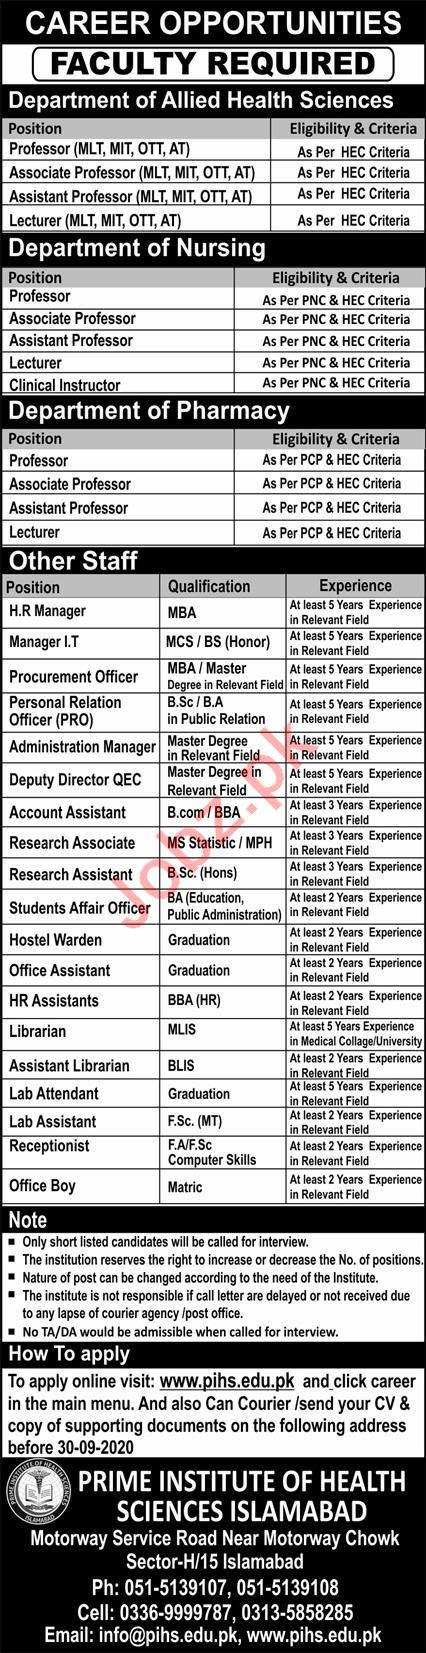 Prime Institute of Health Sciences Islamabad PIHS Jobs 2020